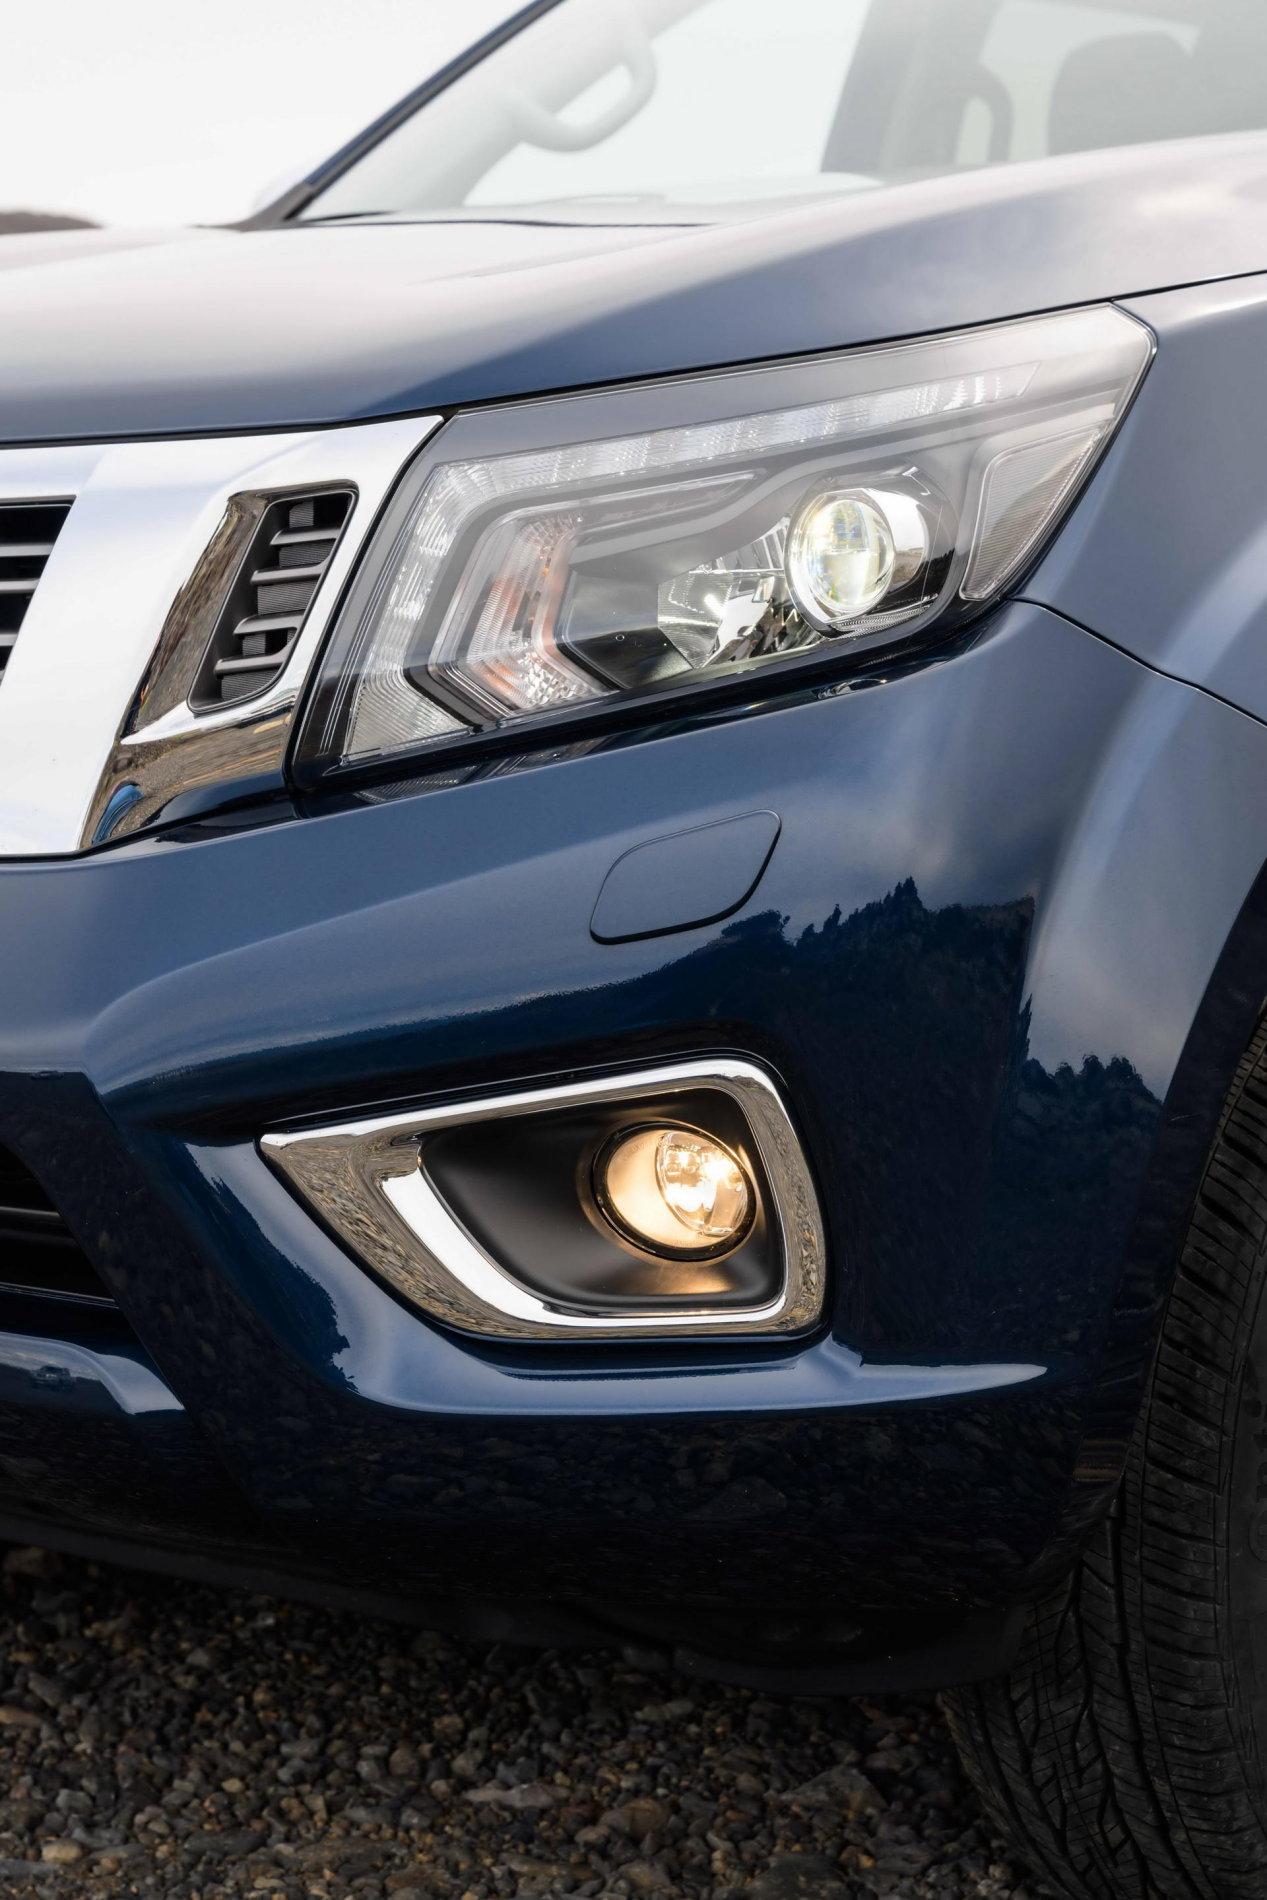 Nissan Navara facelift - Nissan Navara facelift